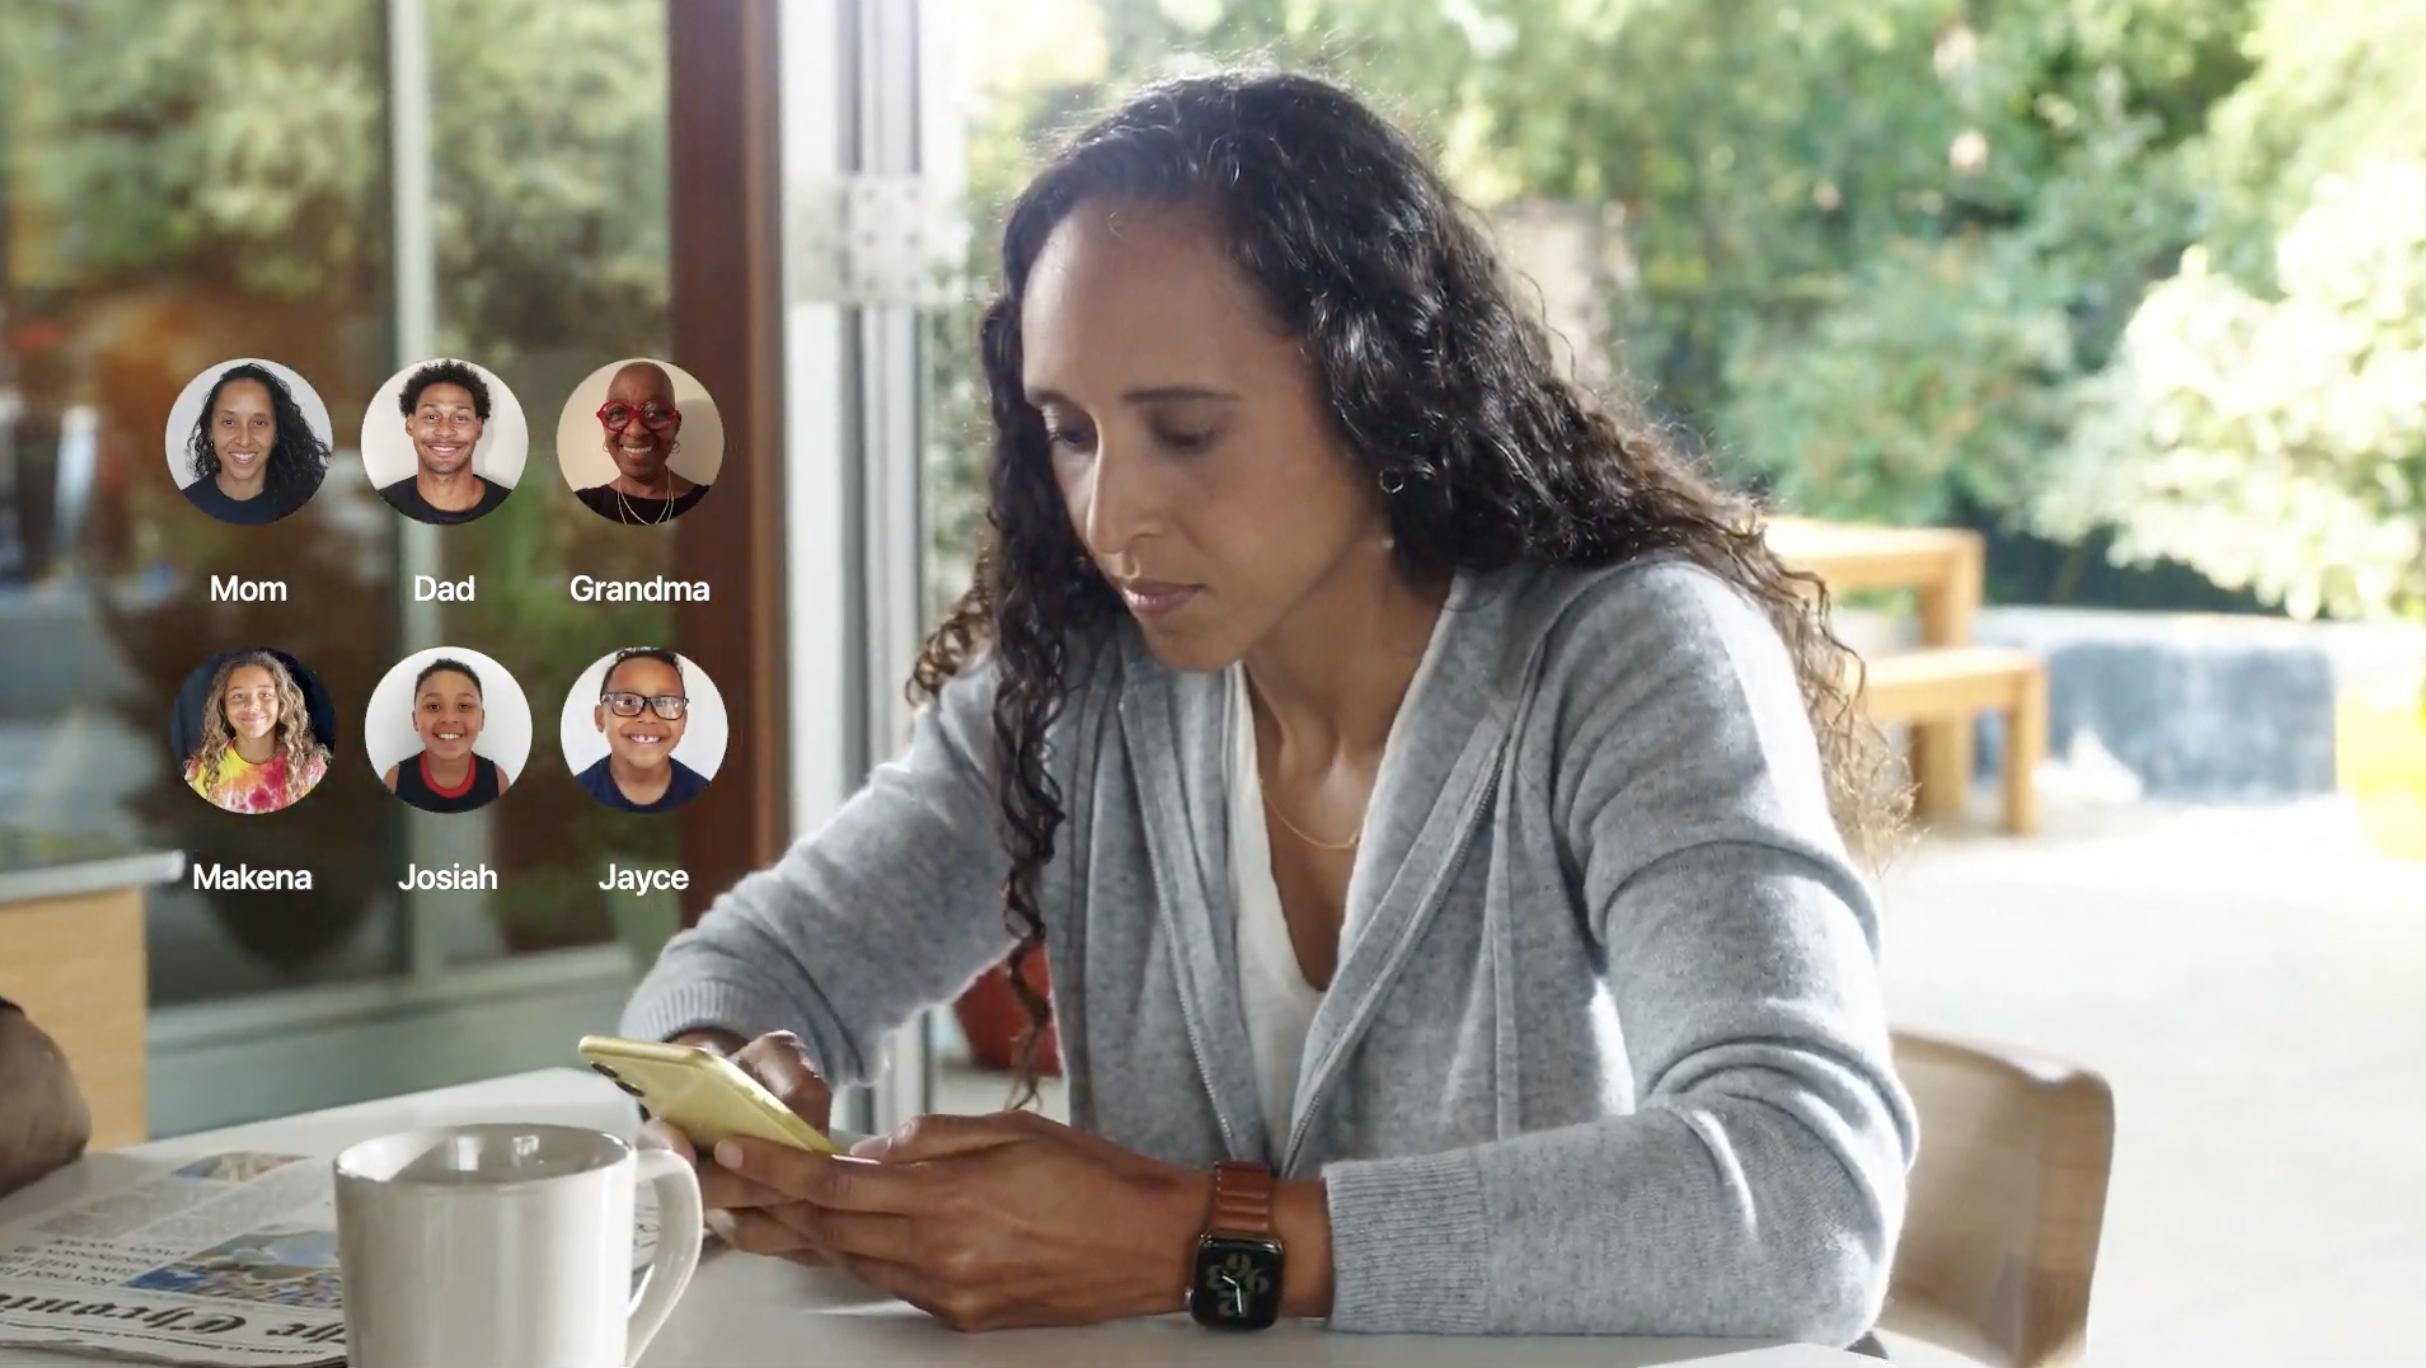 best gps tracker Apple Watch Family Setup